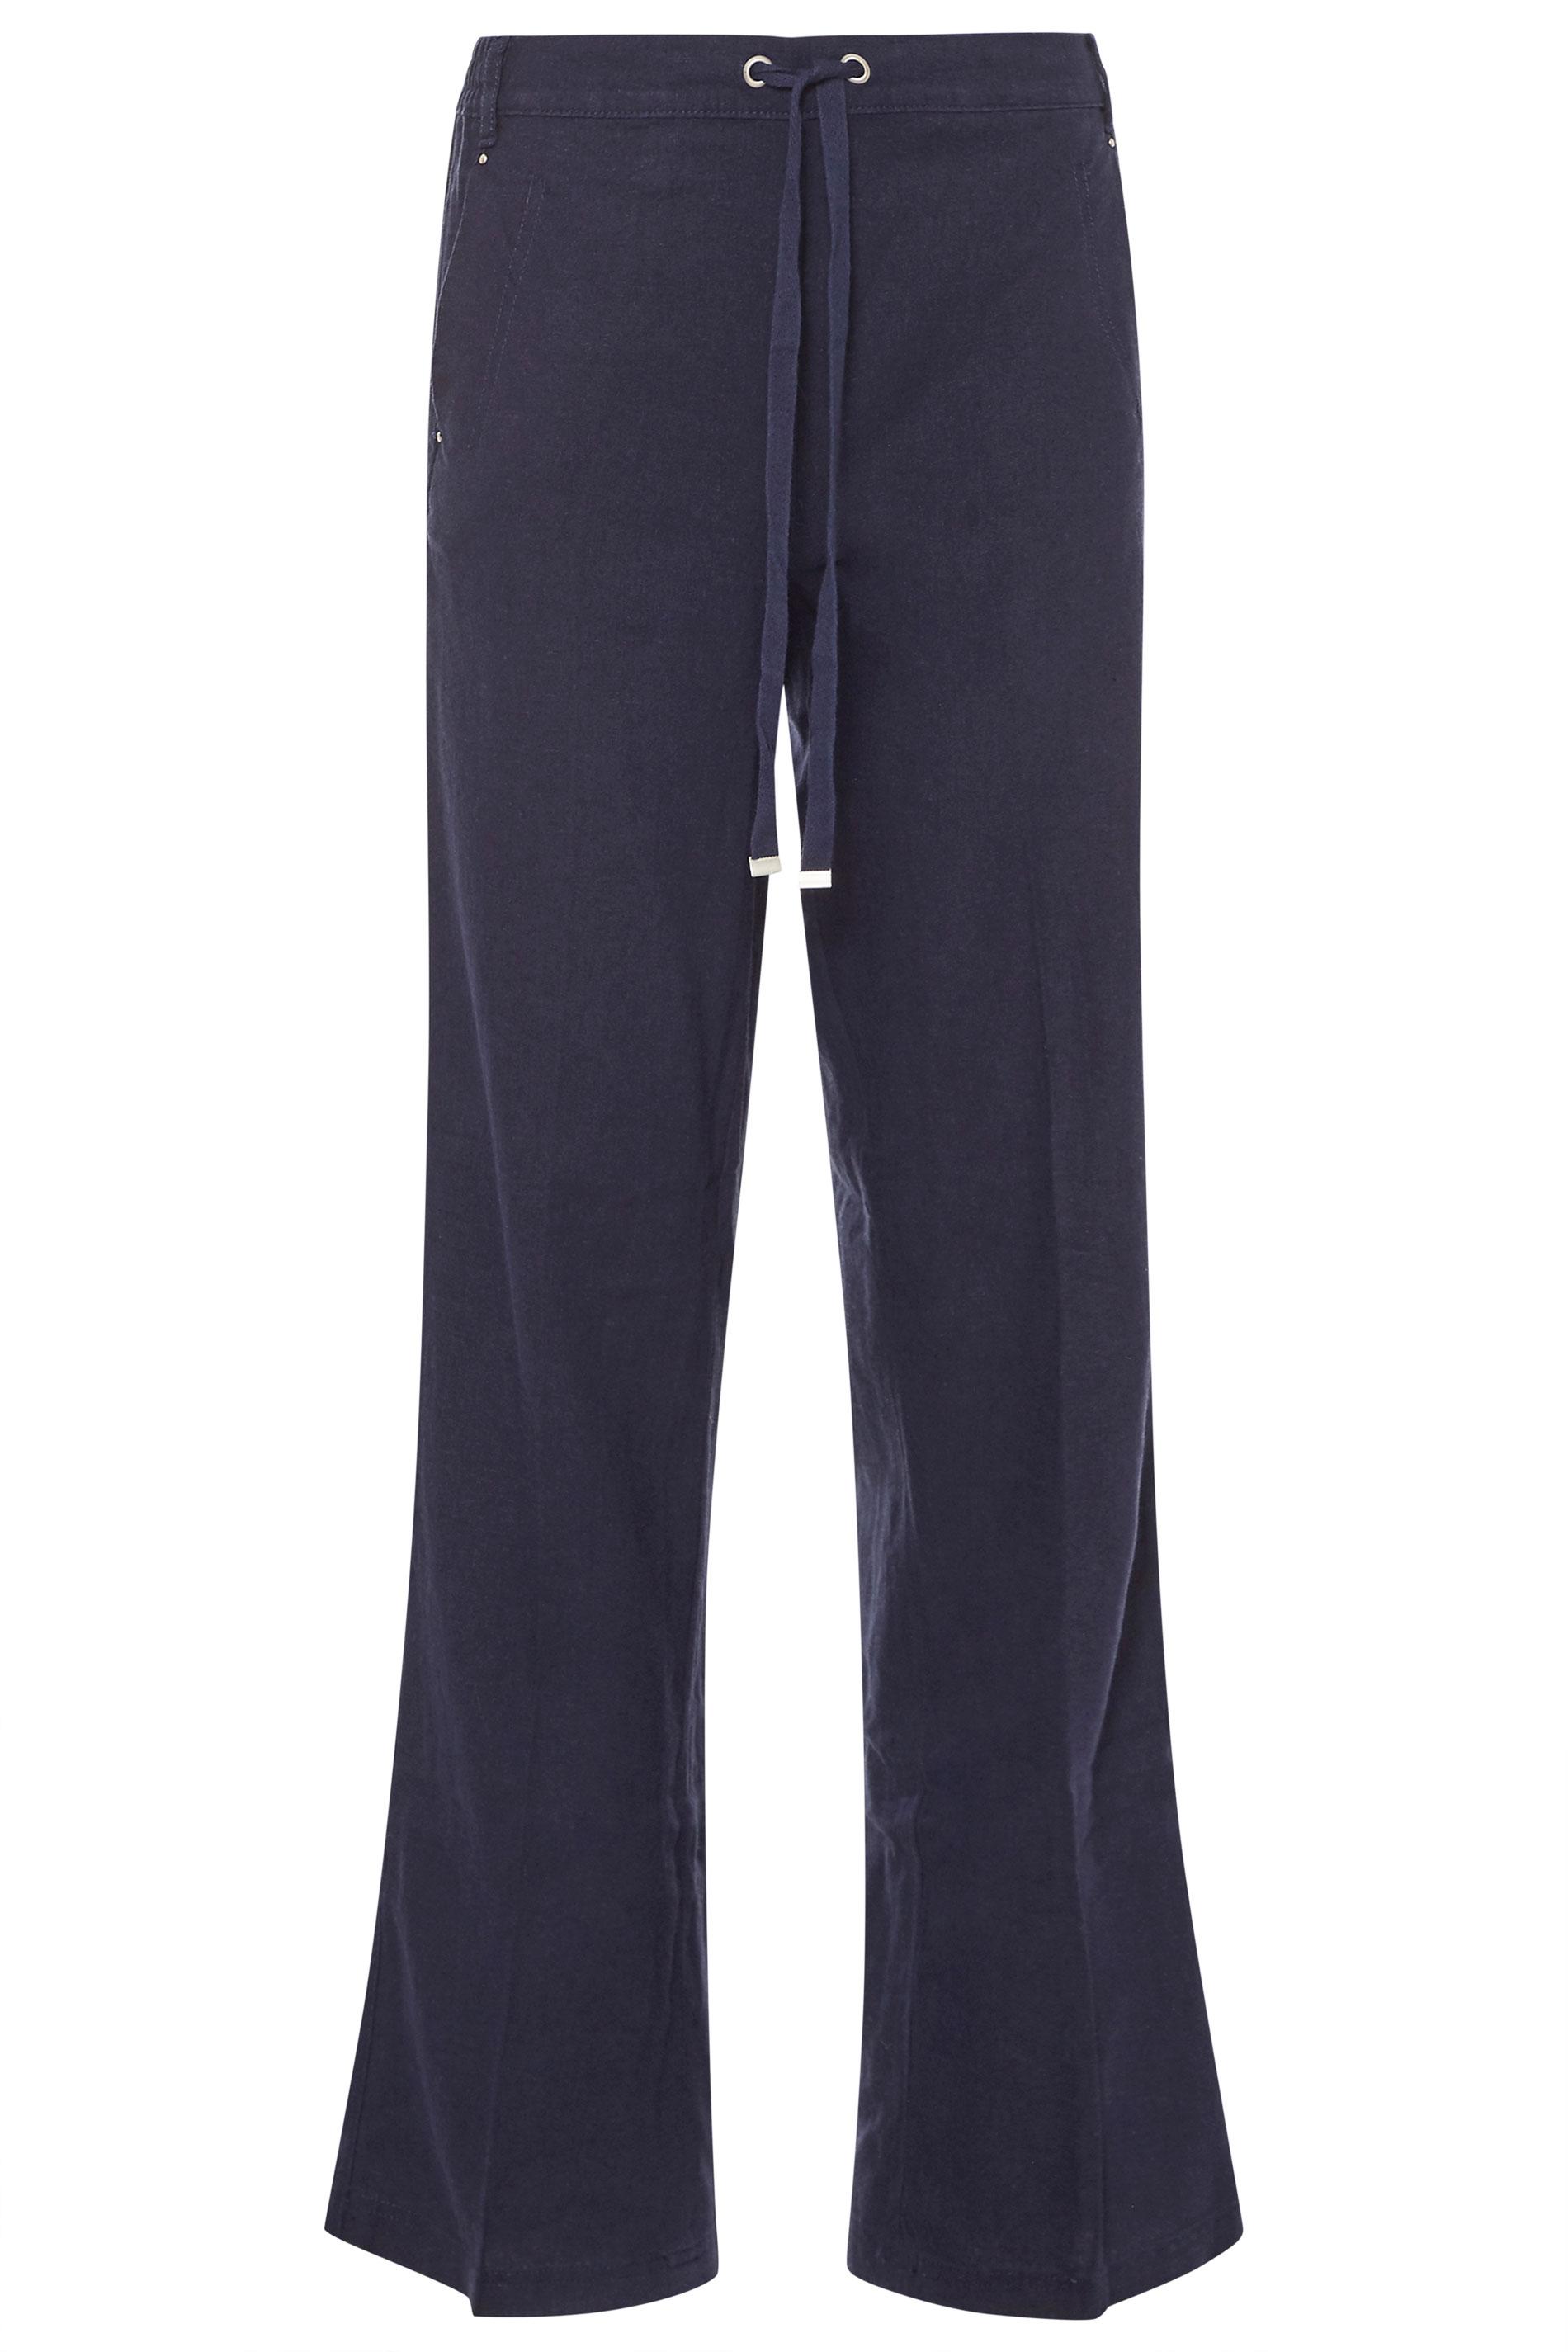 Navy Tie Front Wide Leg Linen Trousers